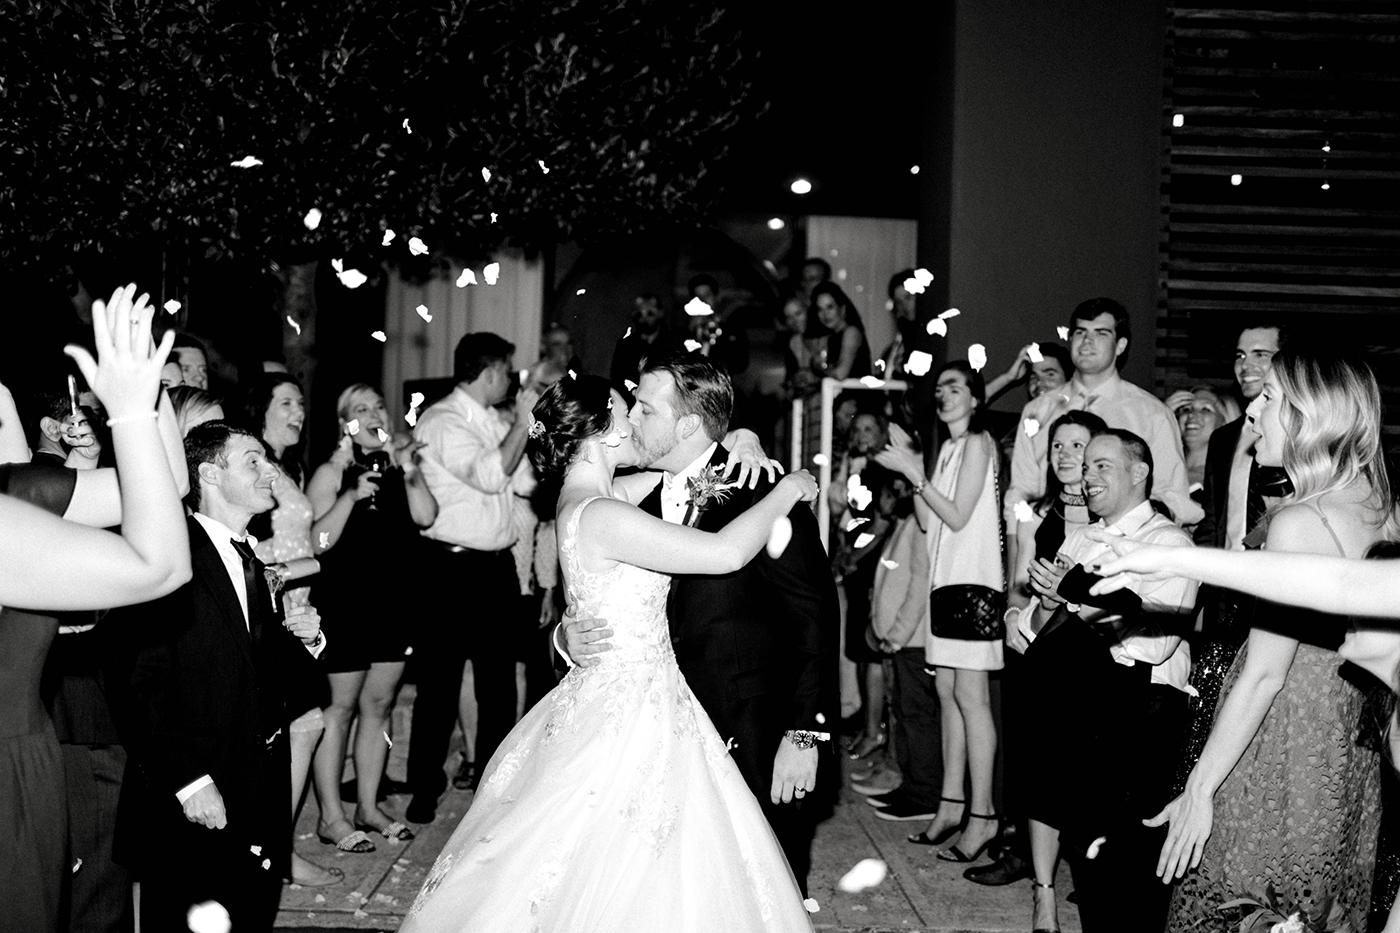 Dallas TX Wedding Planner - Allday Events - Hall on Dragon Wedding - 00345.jpg